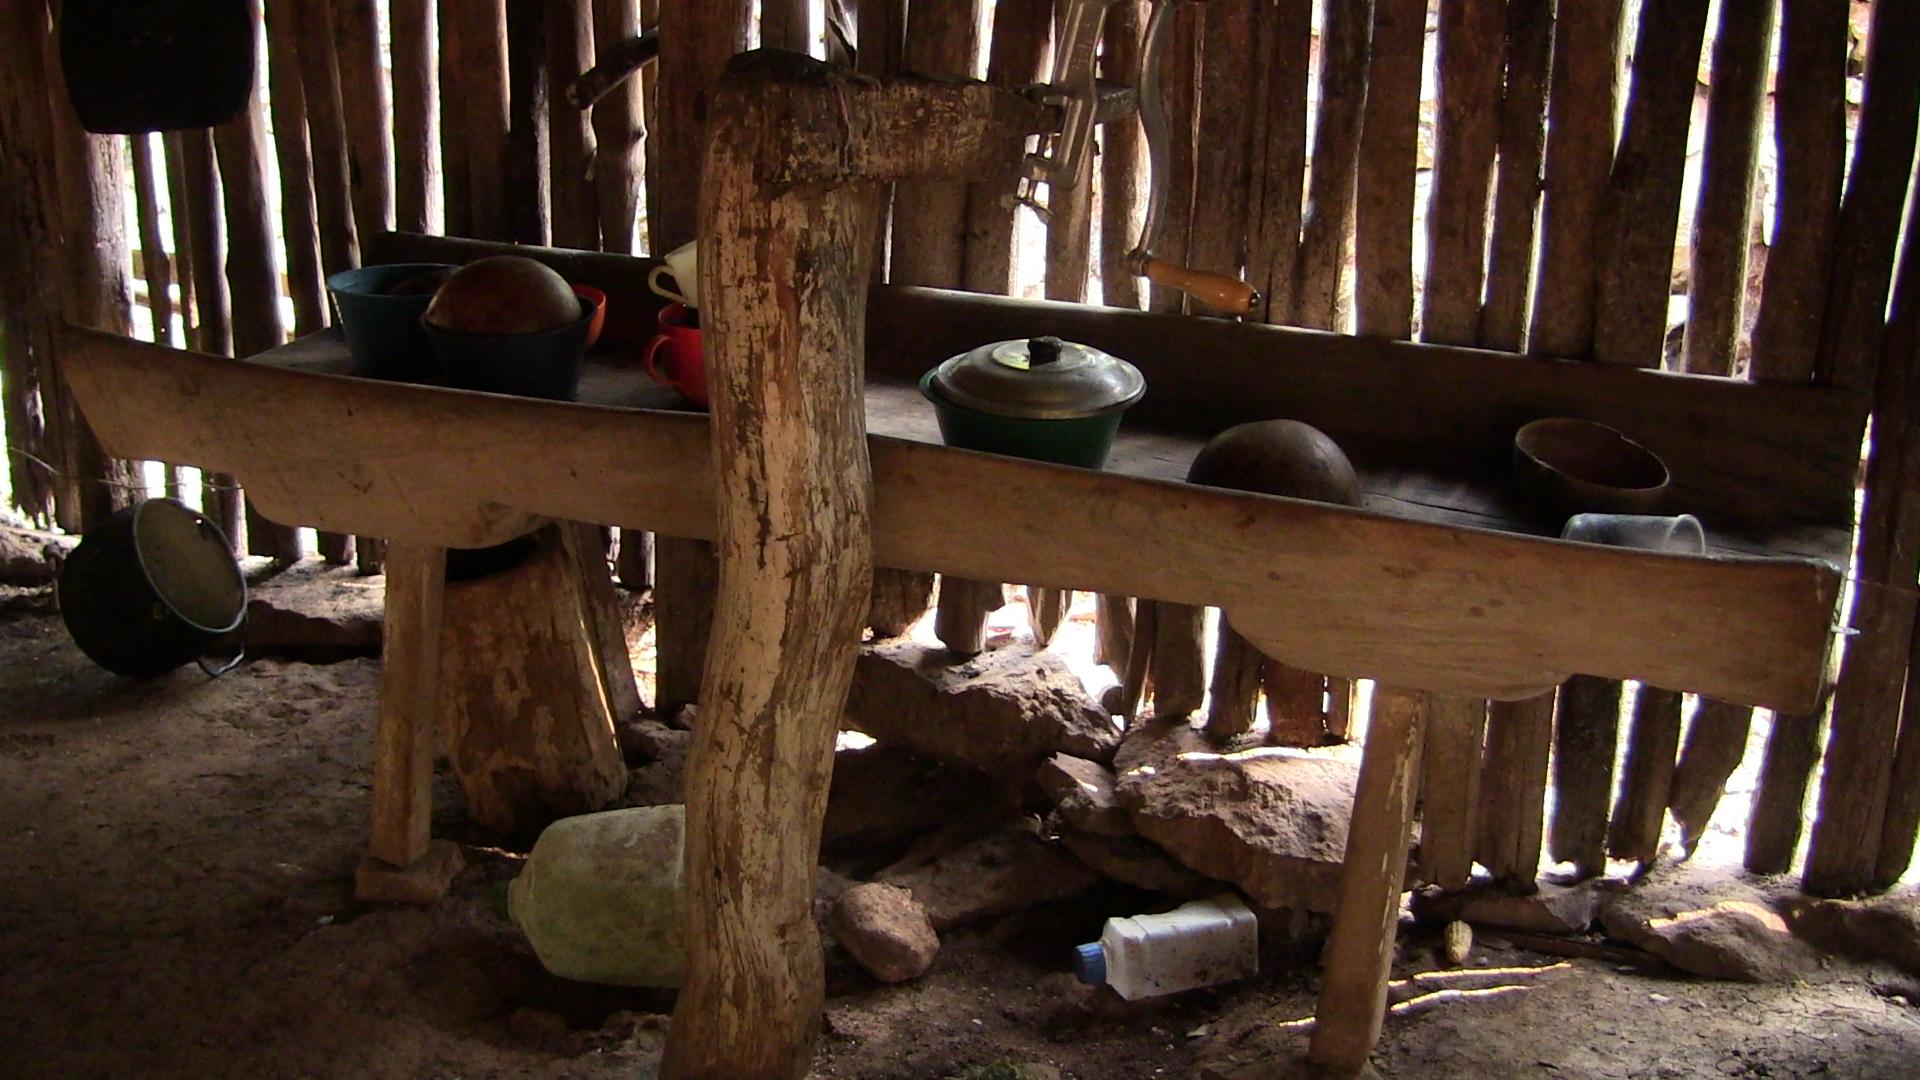 el kaajtal vivienda maya yucateca guardianes films